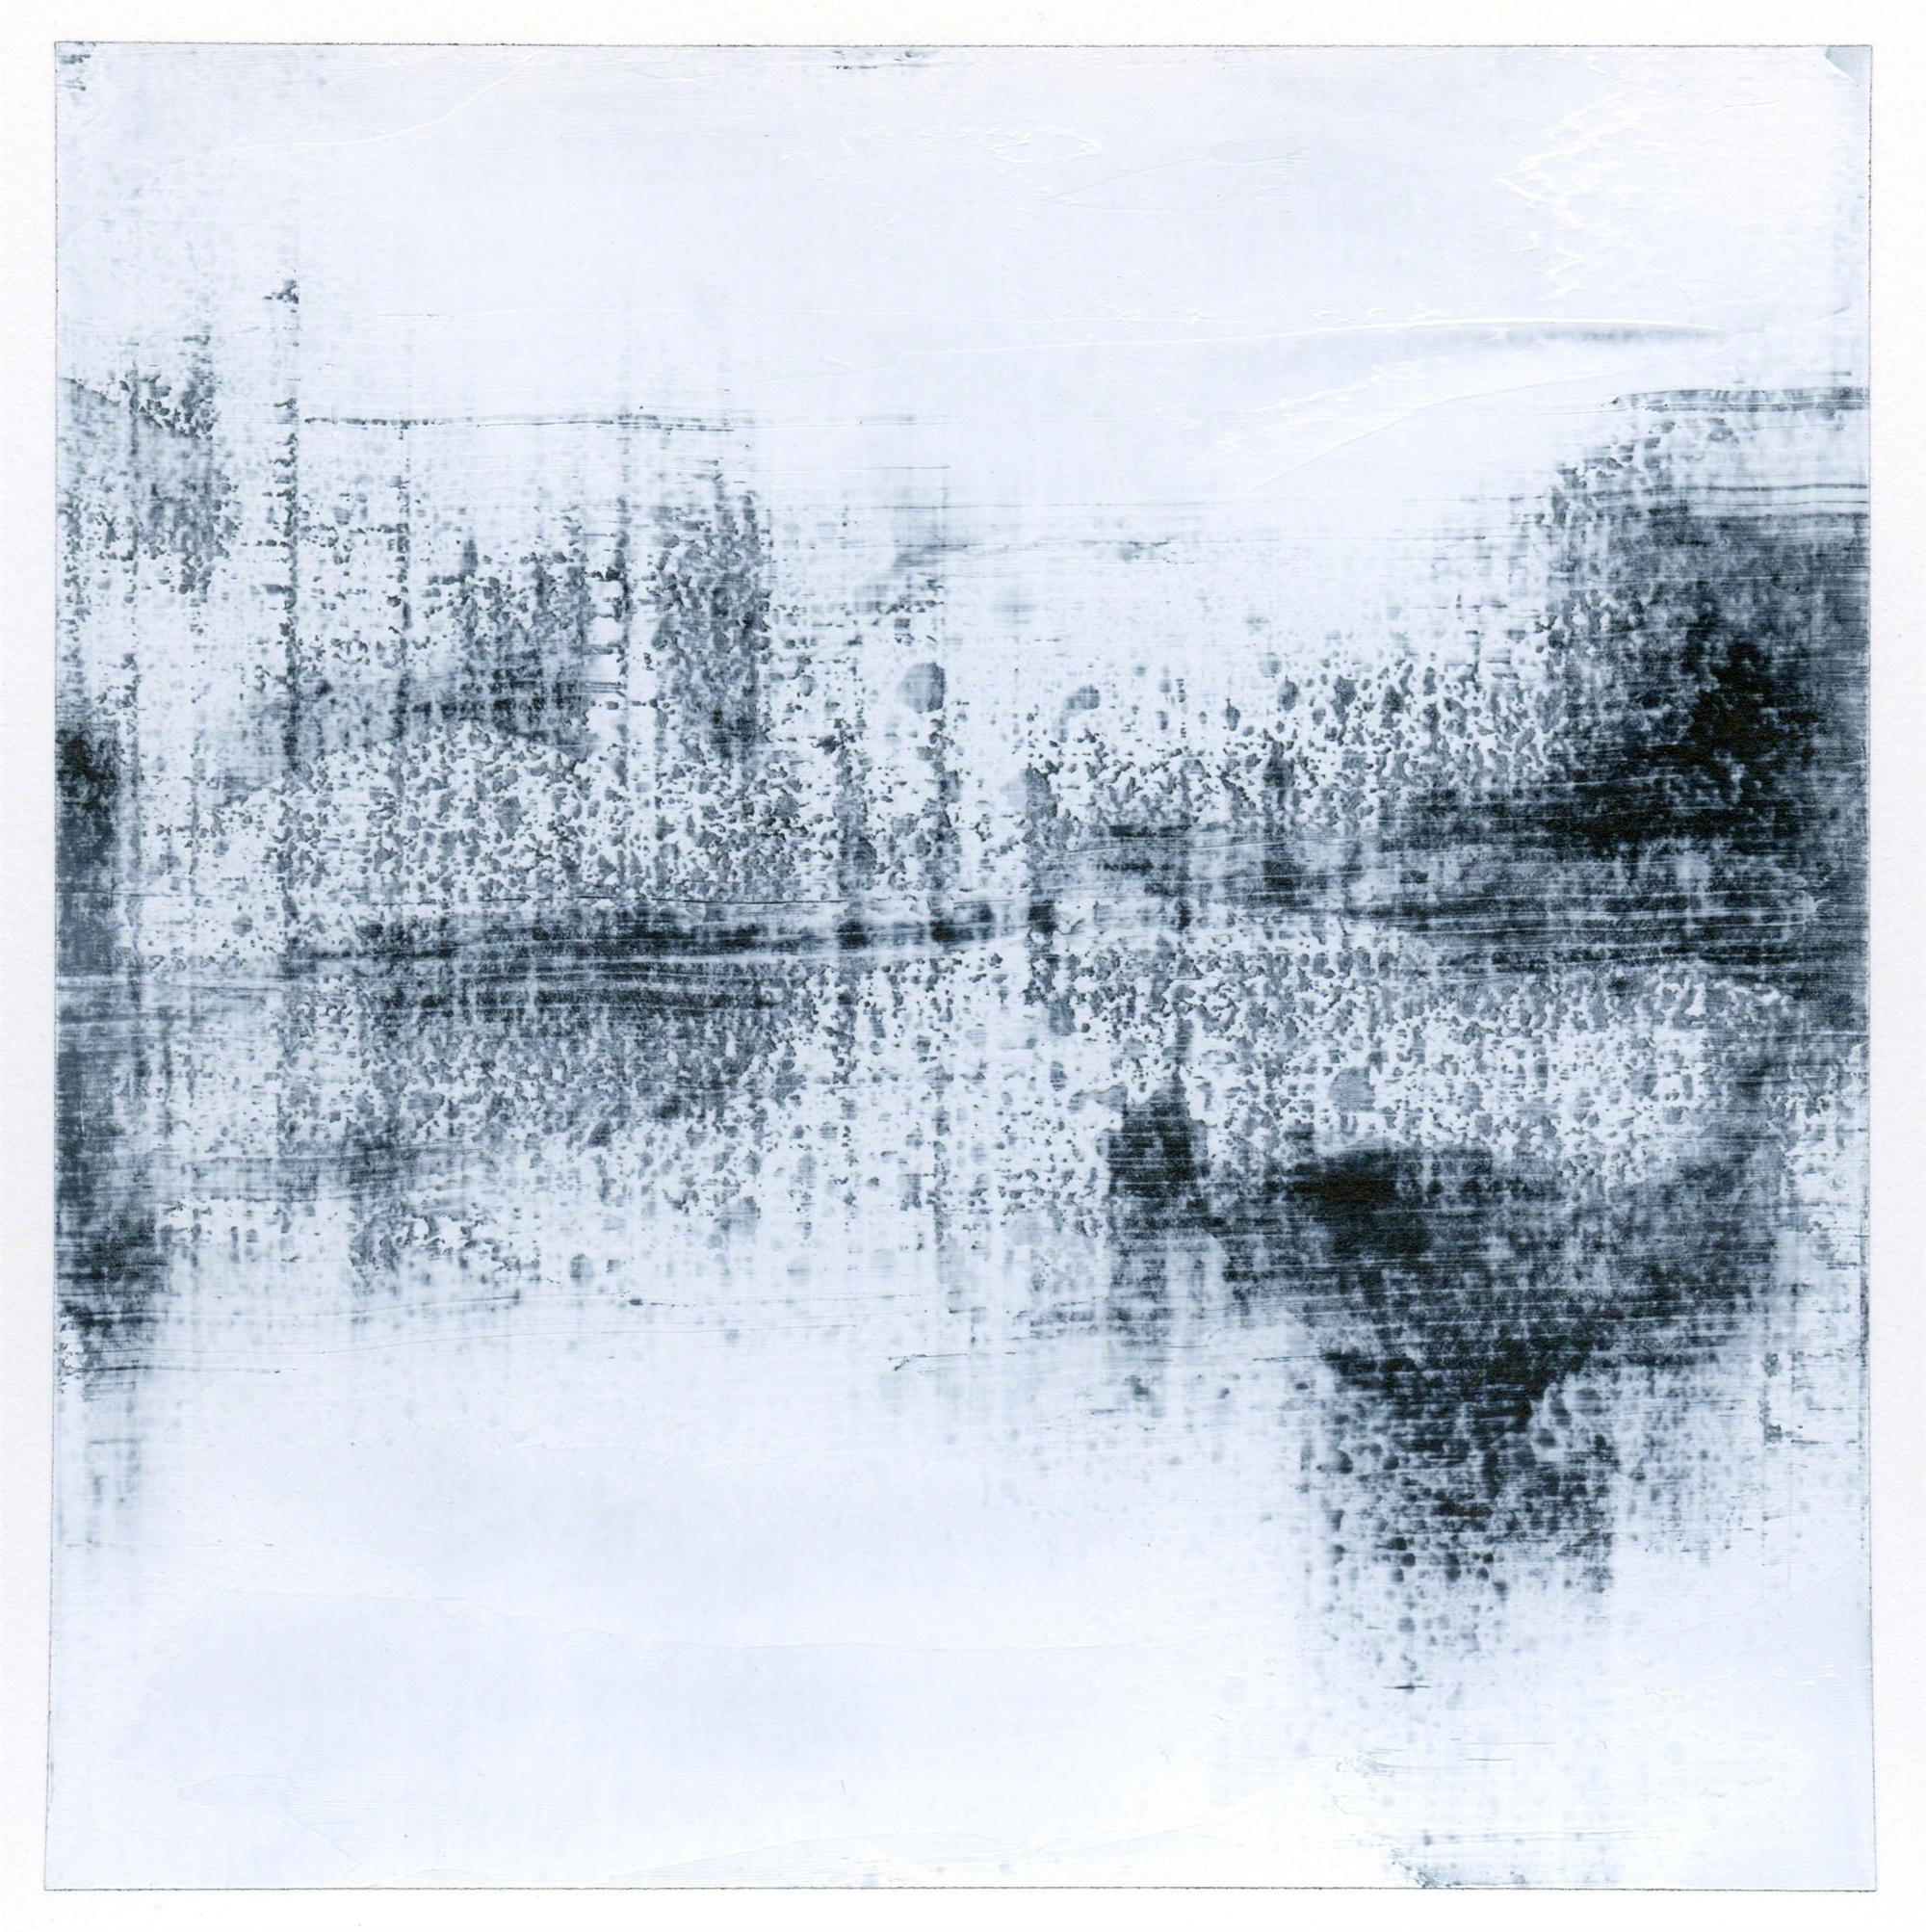 Untitled (17.11.01) by Paul Moran